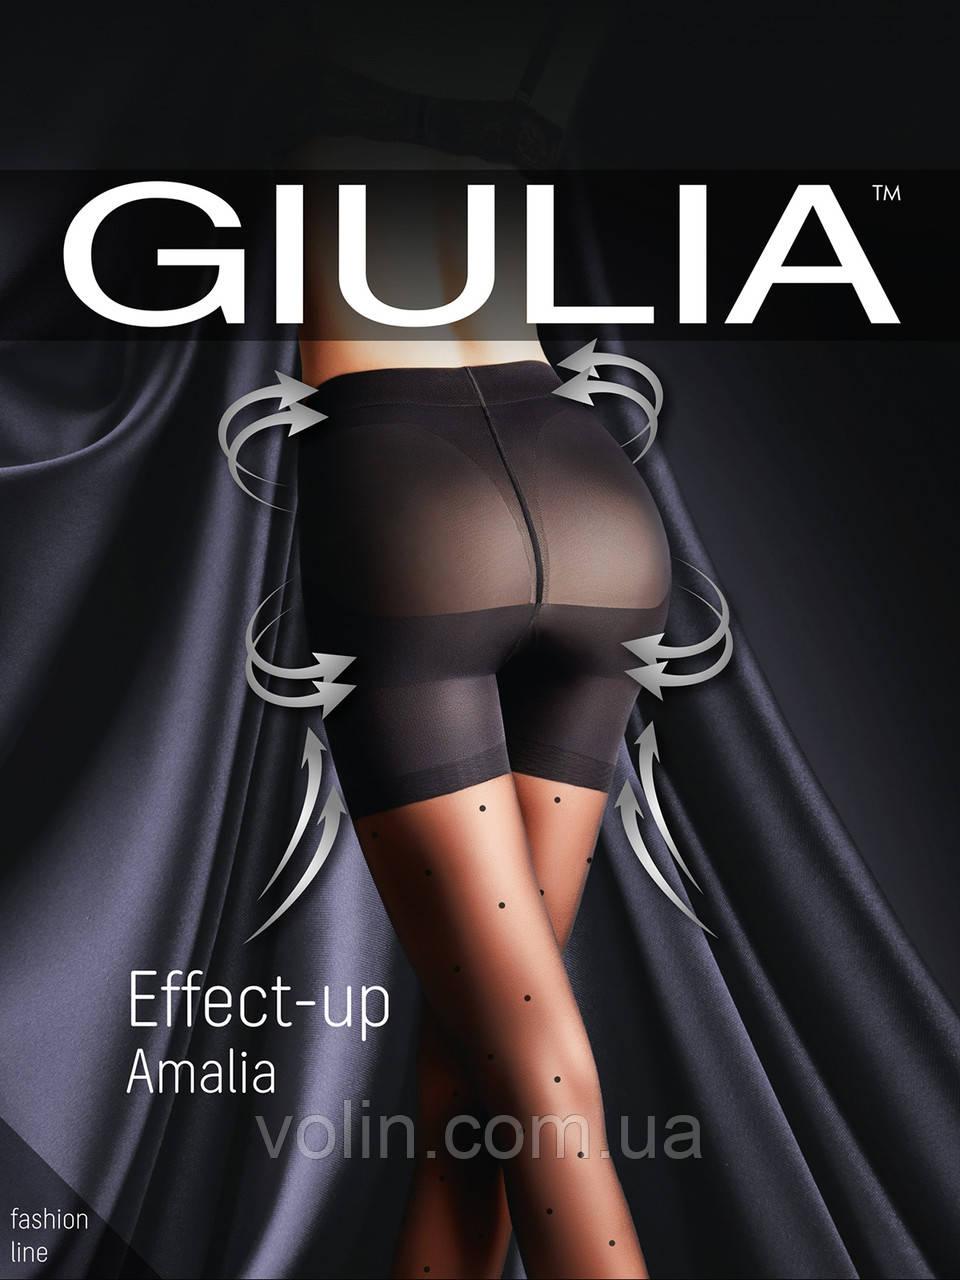 Колготки Giulia Effect-Up Amalia 40.